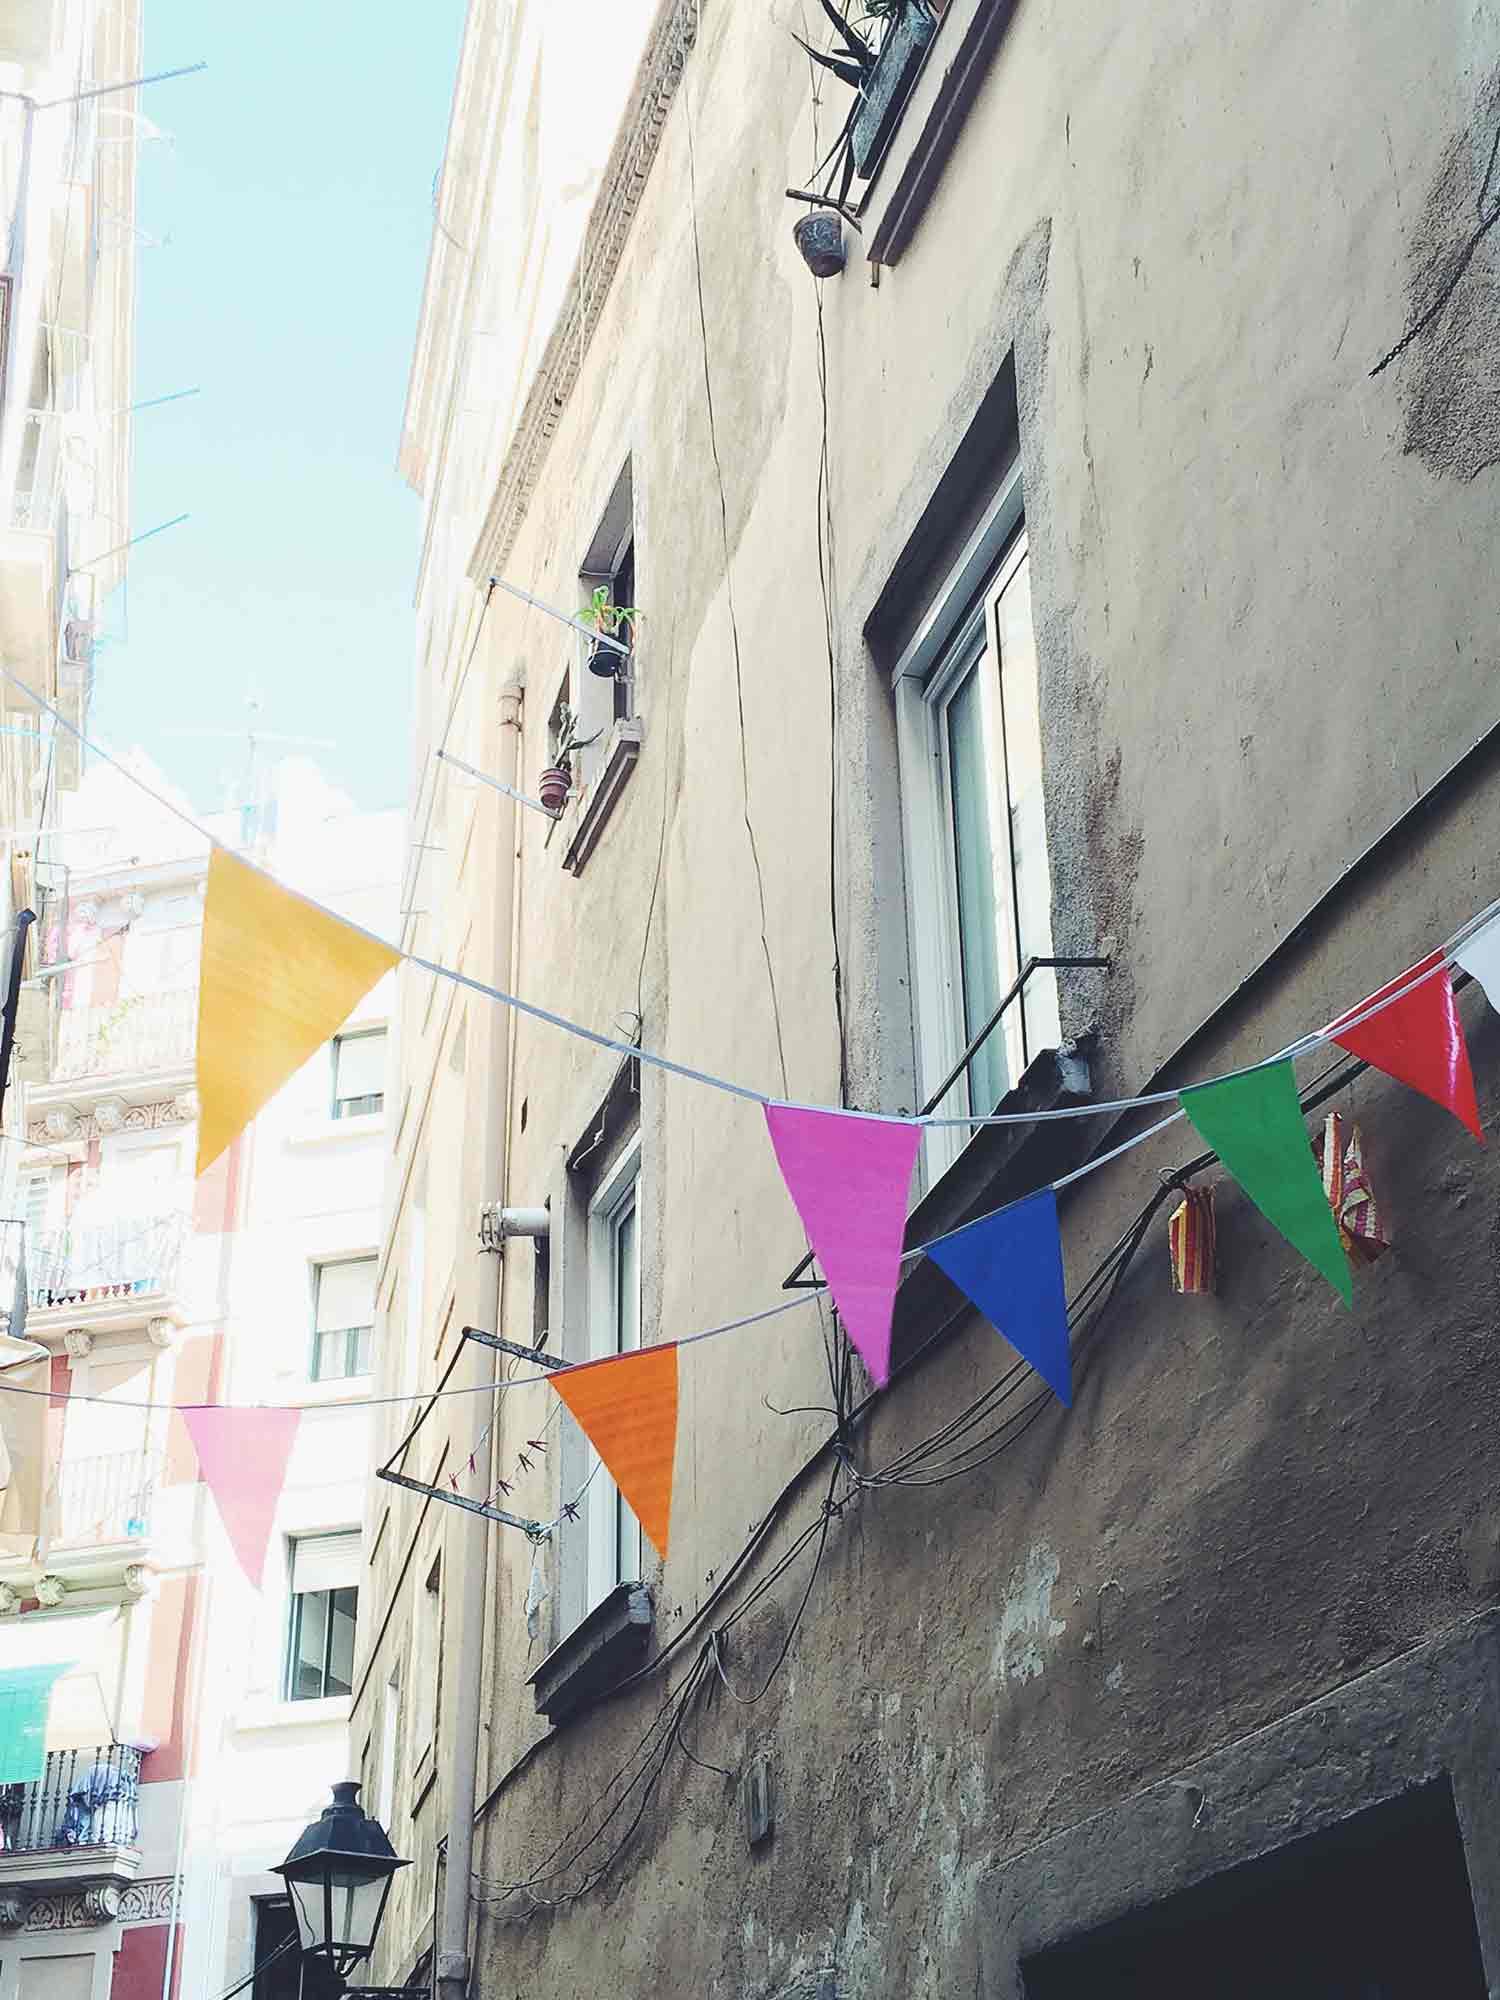 Barcelona_Streets-of-Color-OPT.jpg